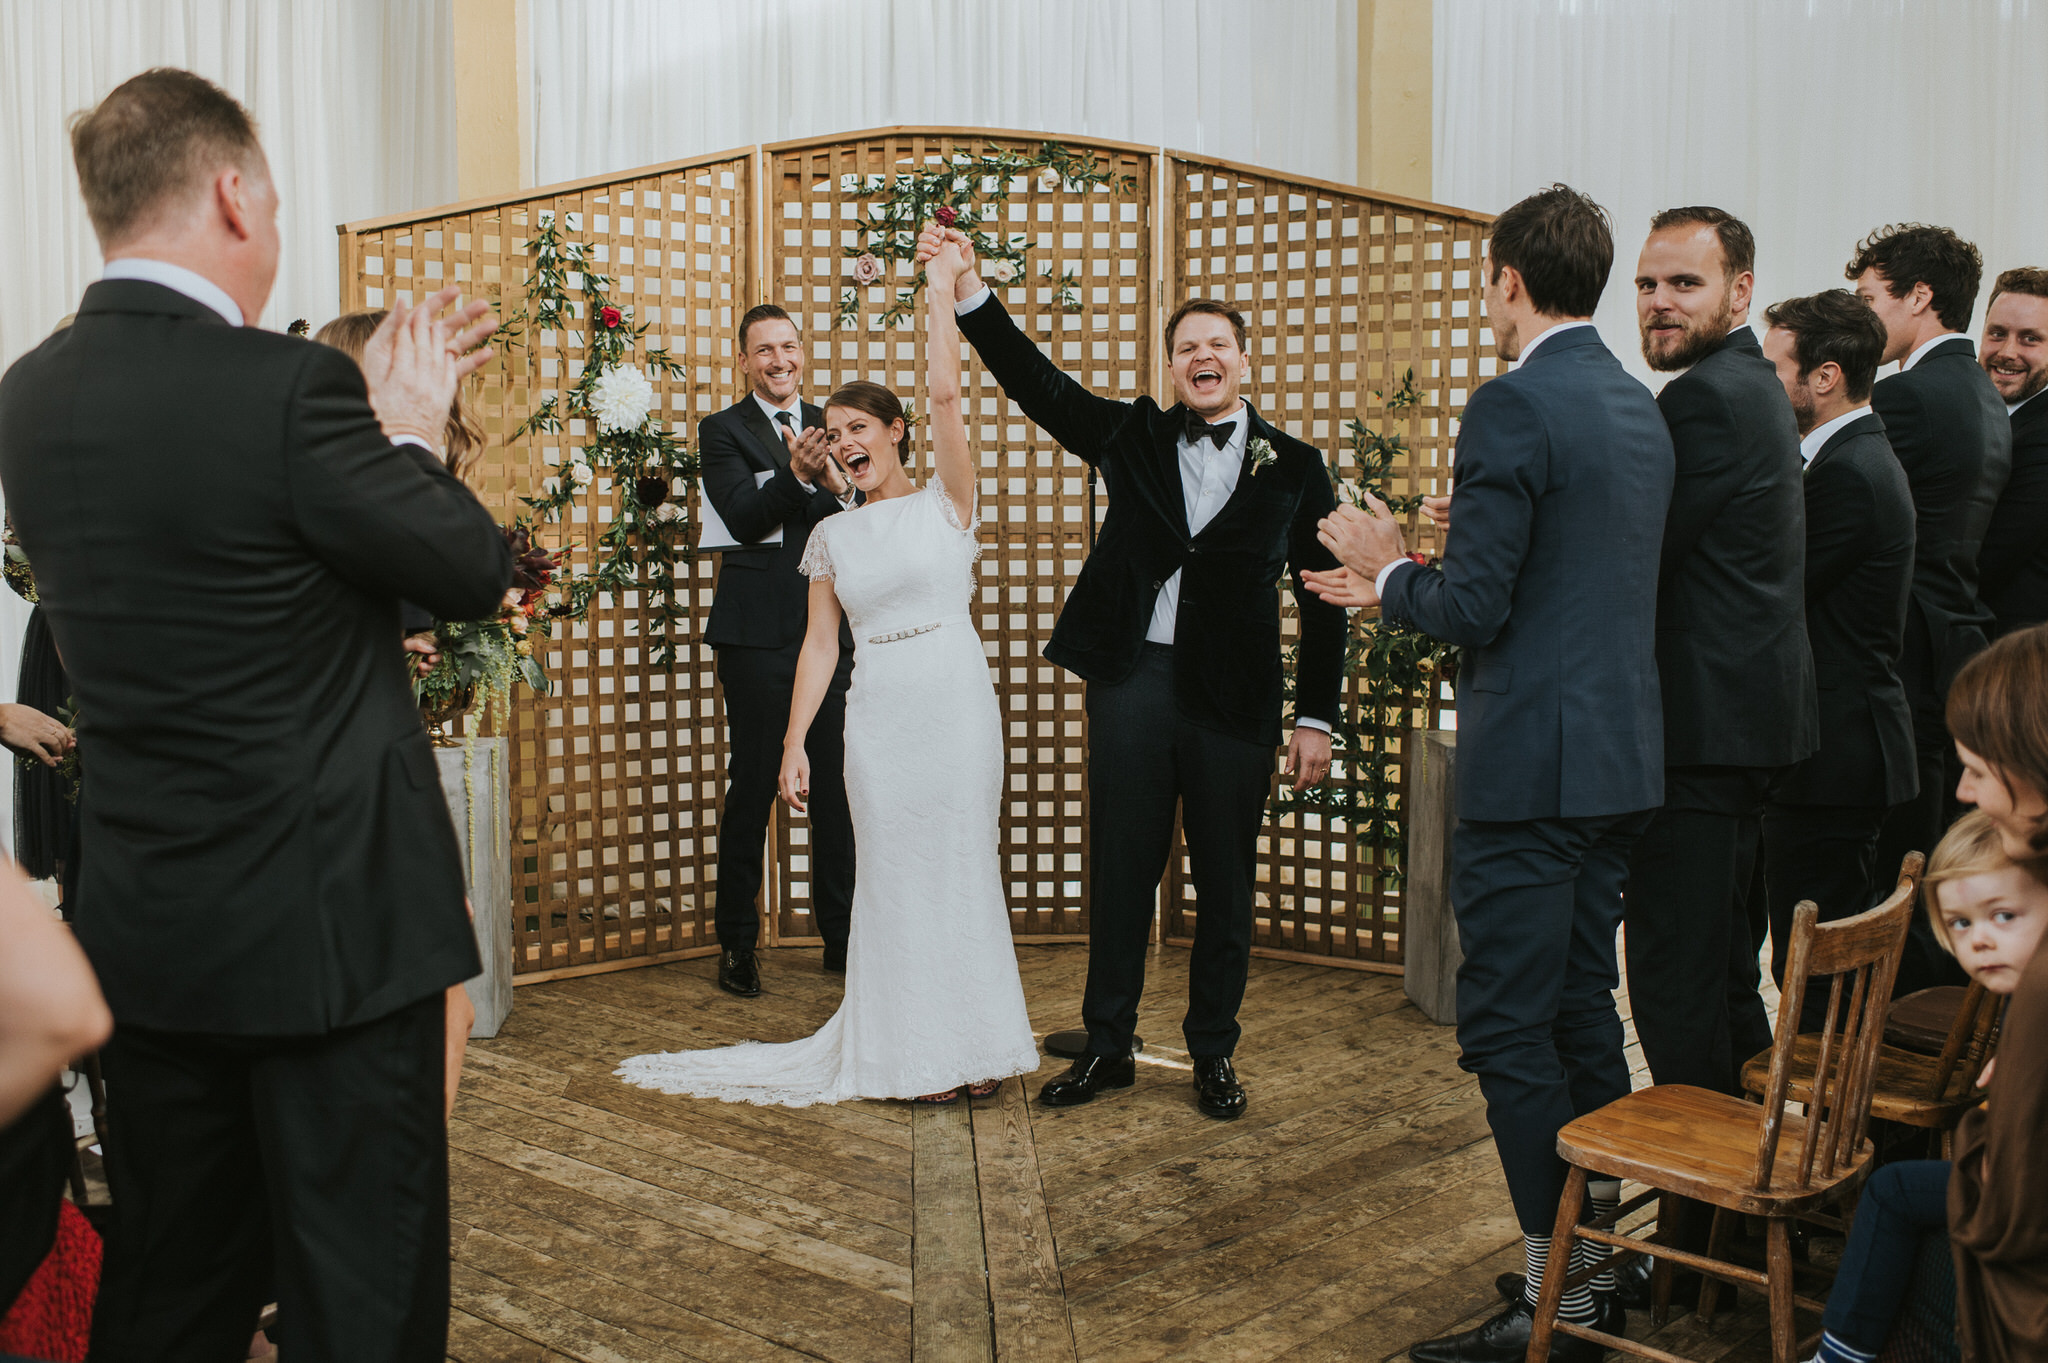 scarletoneillphotography_weddingphotography_prince edward county weddings121.JPG